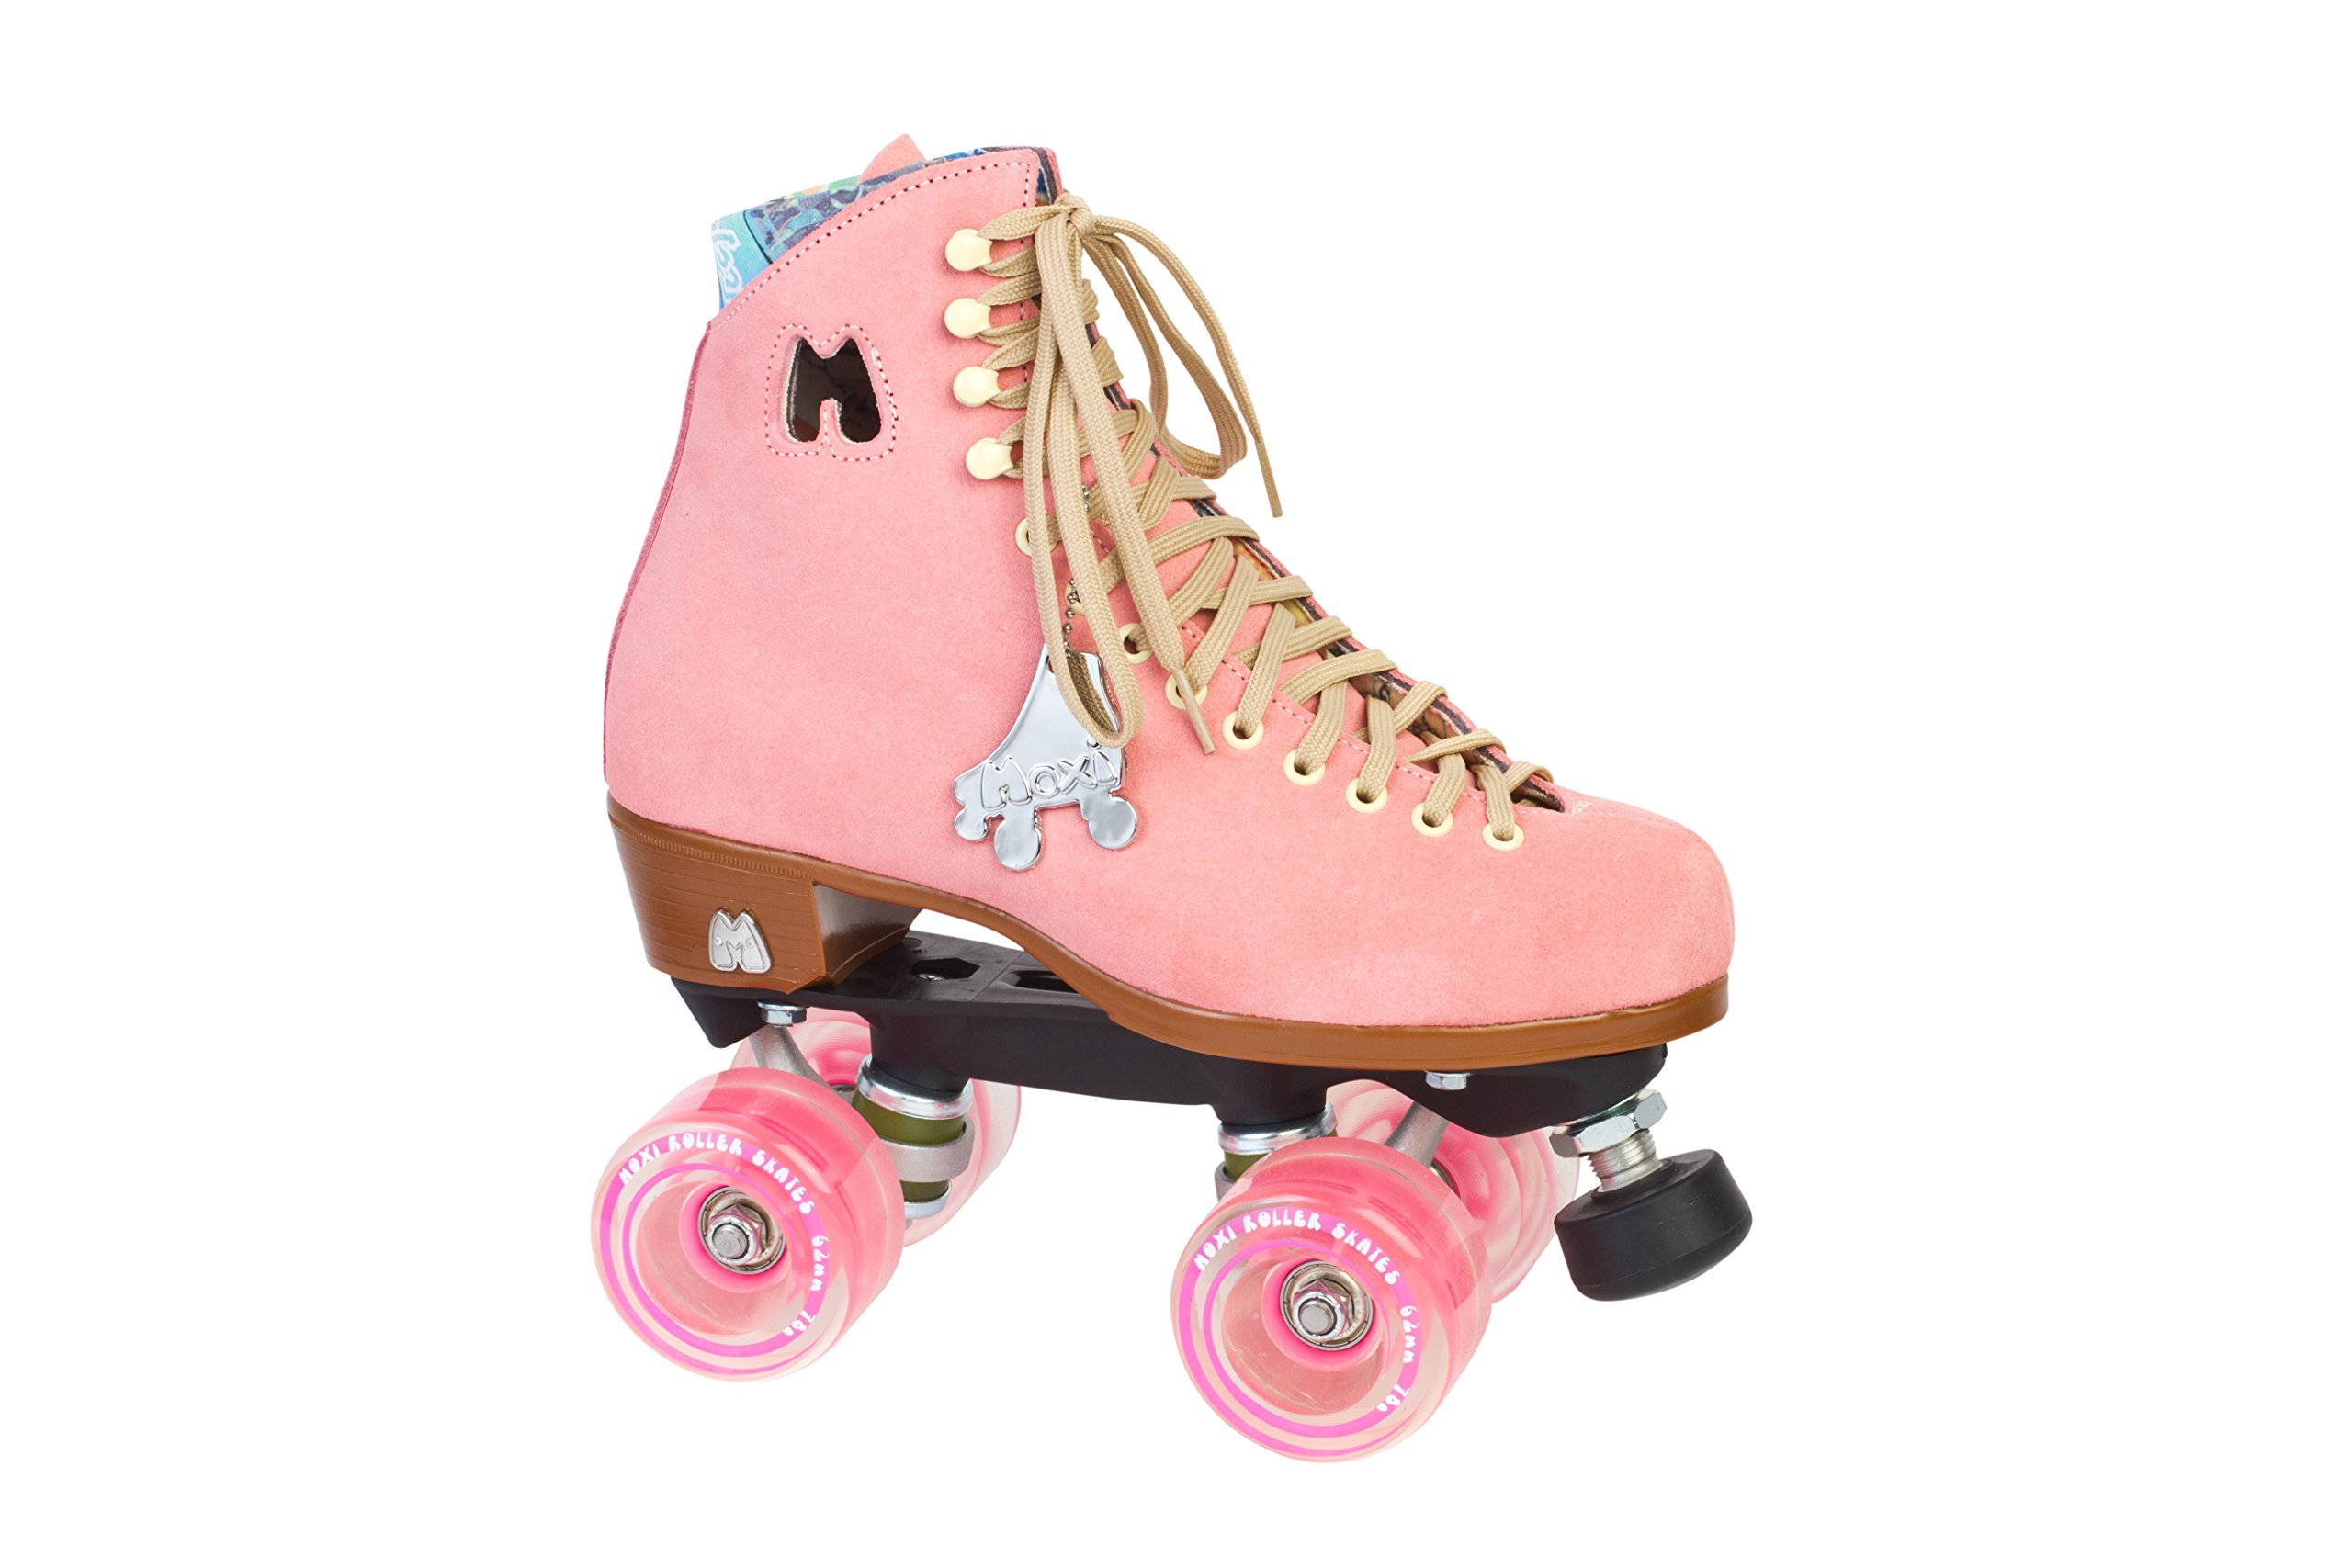 Moxi Roller Skates Lolly Roller Skates,Pink,9